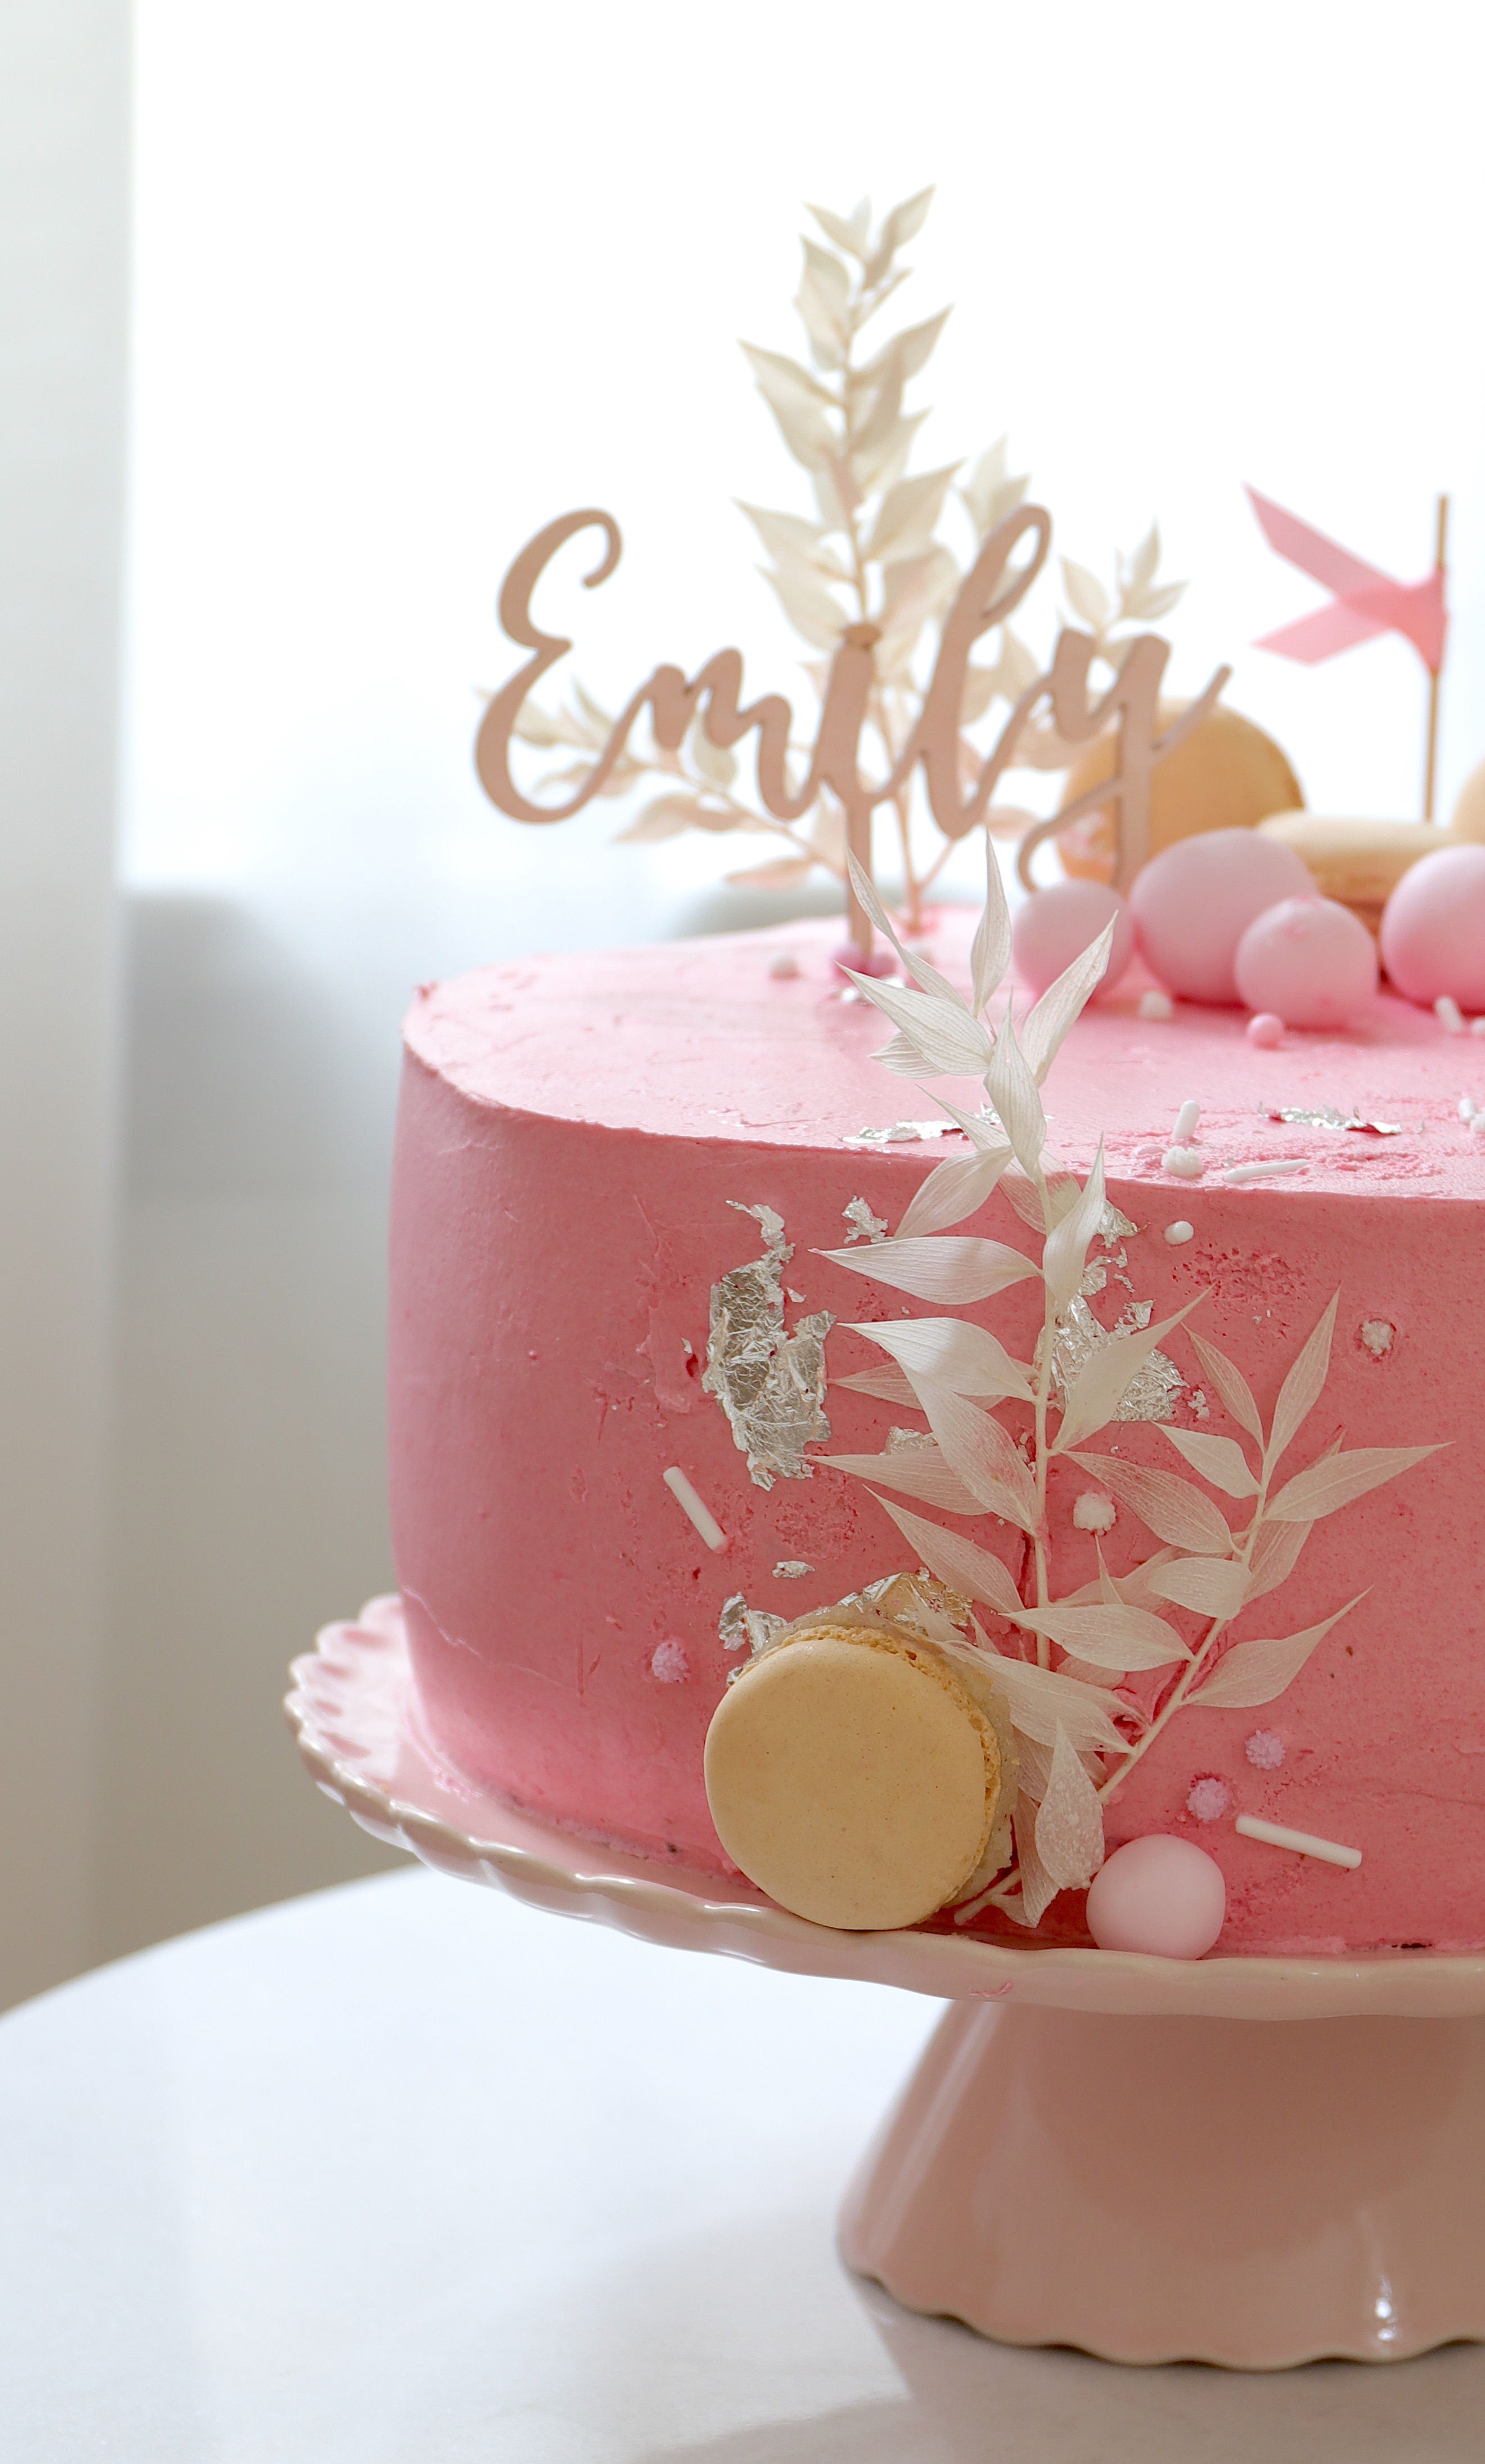 Rezept Torte Taufe mit Biskuit in Rosa